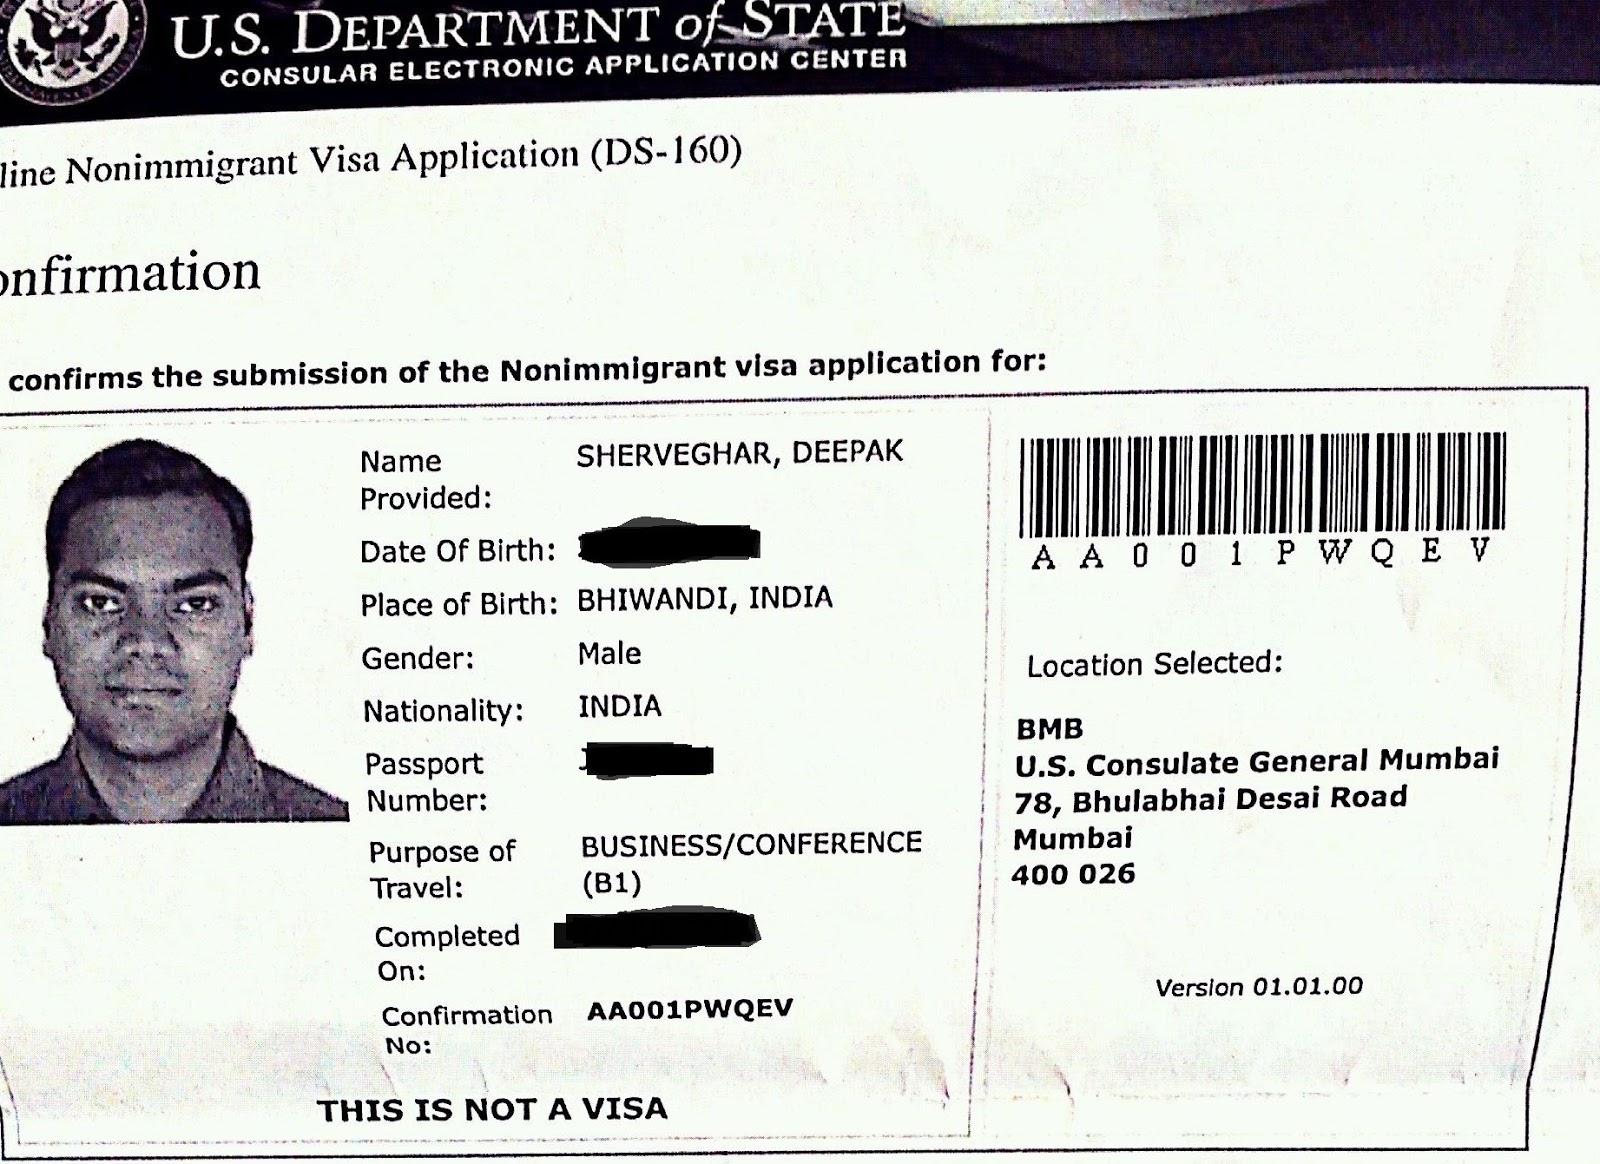 Reschedule visa appointment us consulate mumbai case